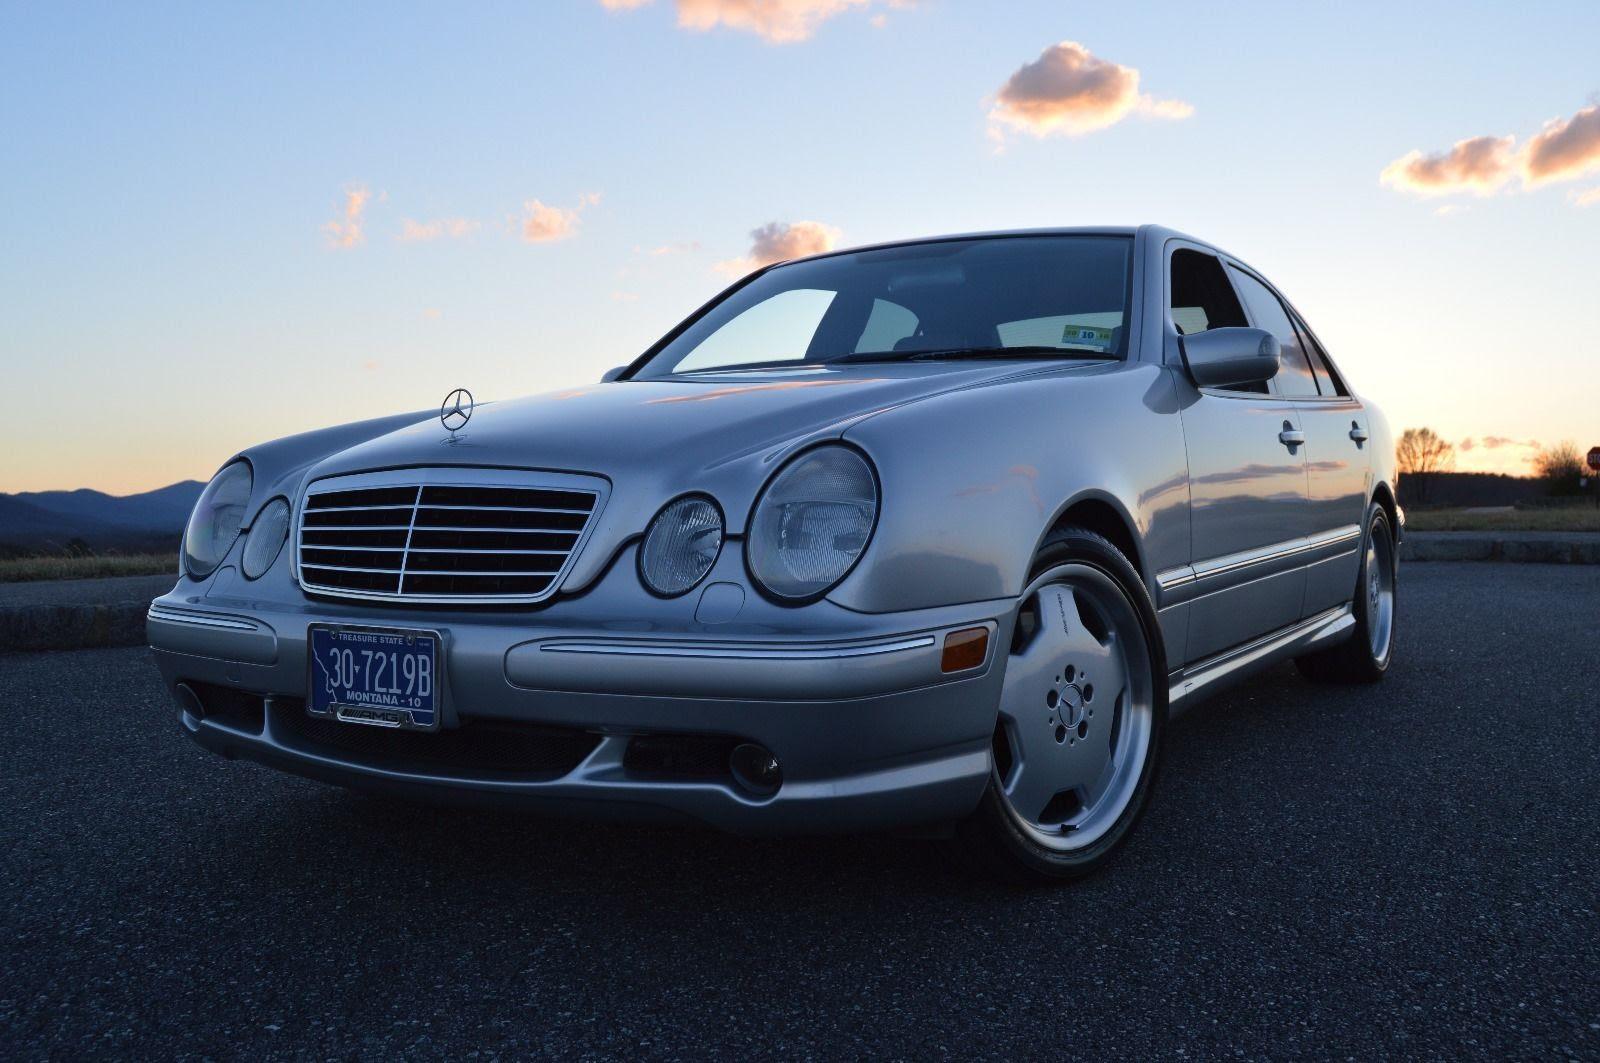 2001 Mercedes-Benz E55 AMG   German Cars For Sale Blog